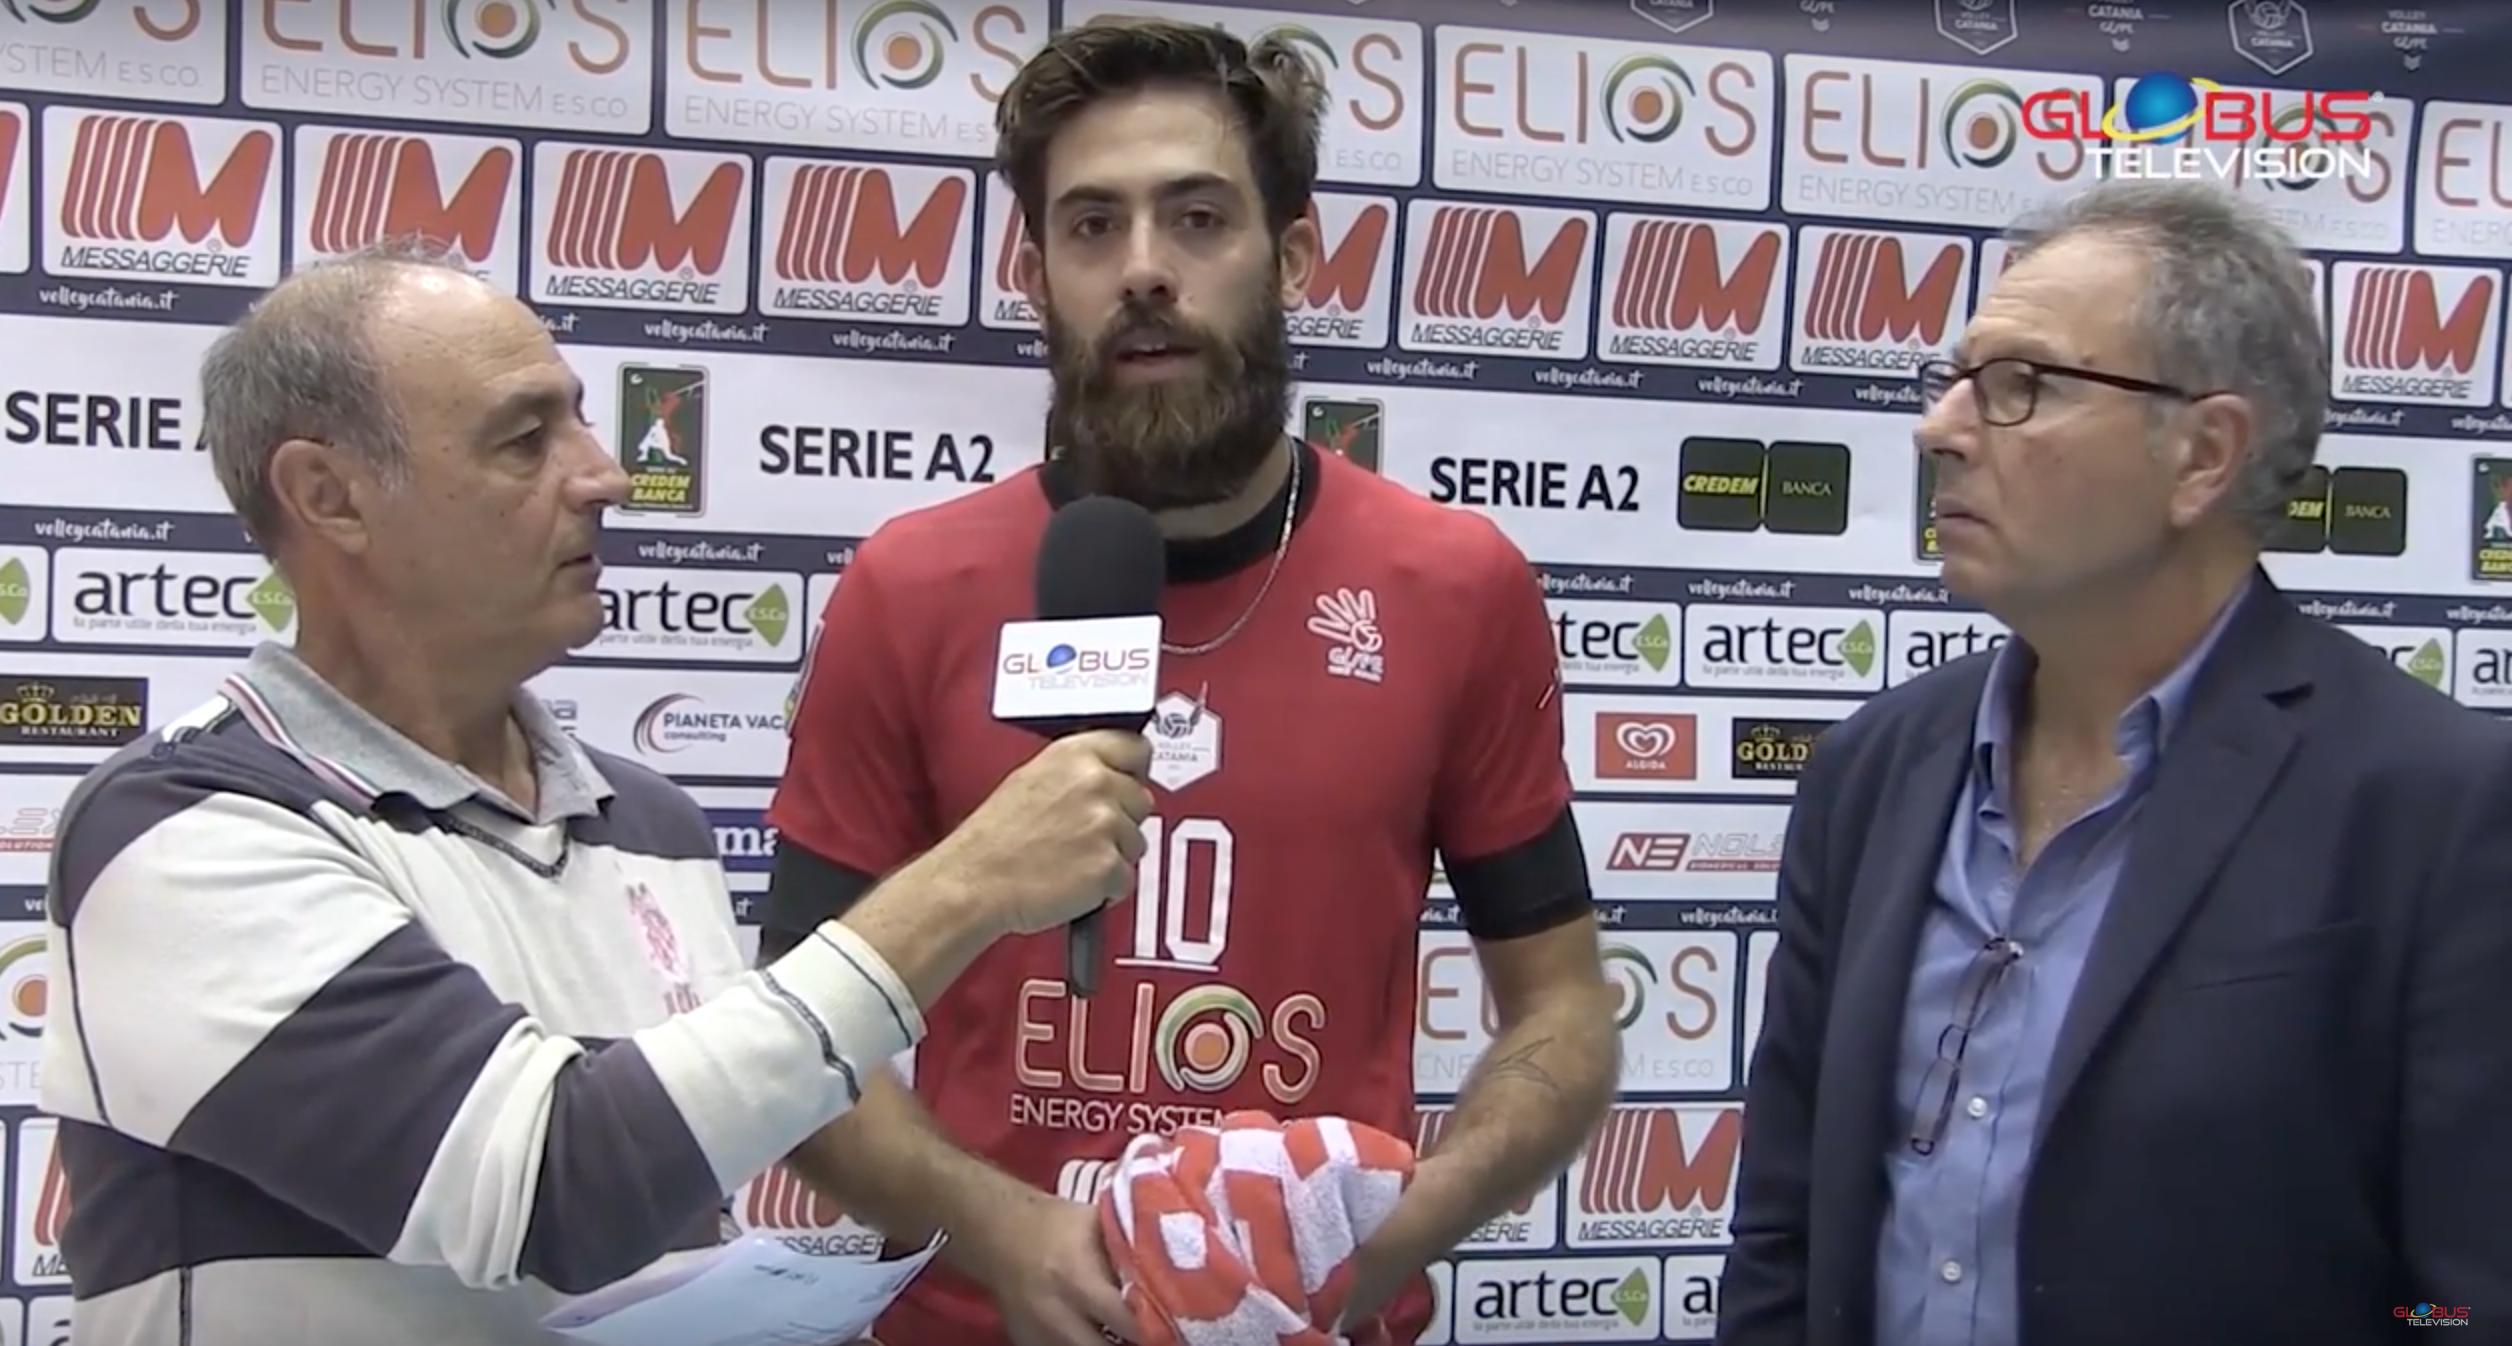 Volley Catania - Globus Television